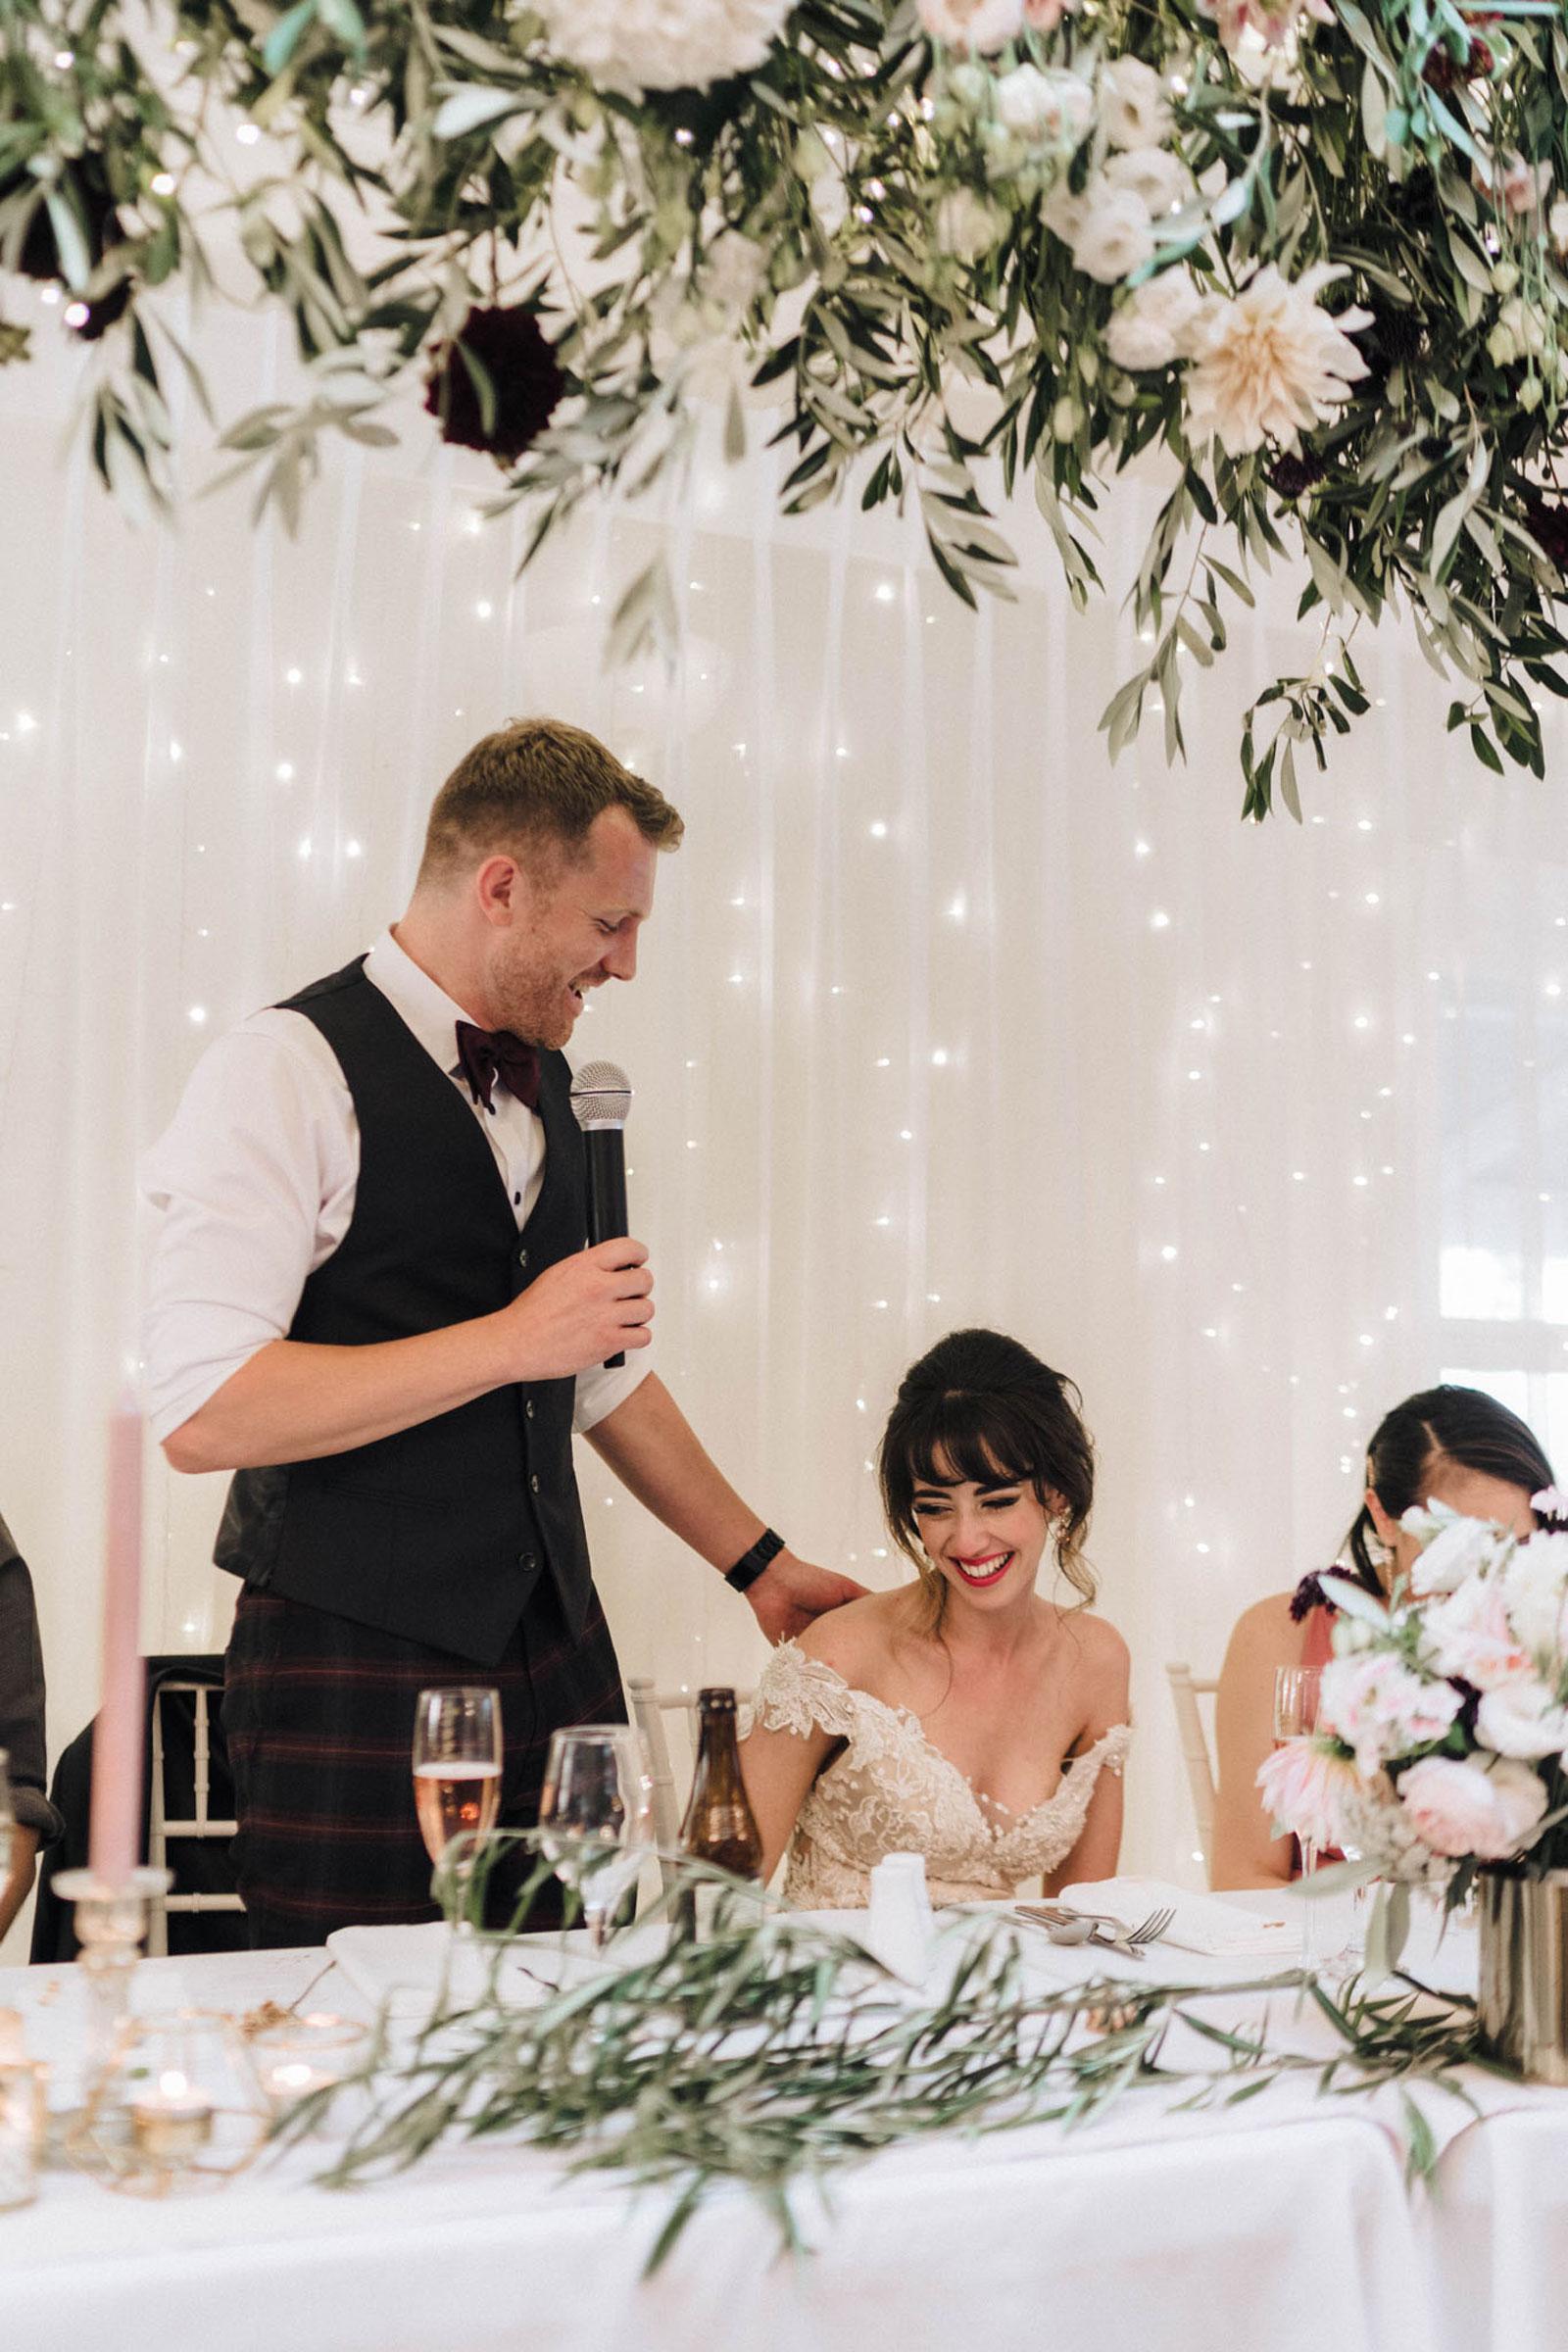 newfound-n-c-olive-tree-cottage-tauranga-wedding-photographer-1101